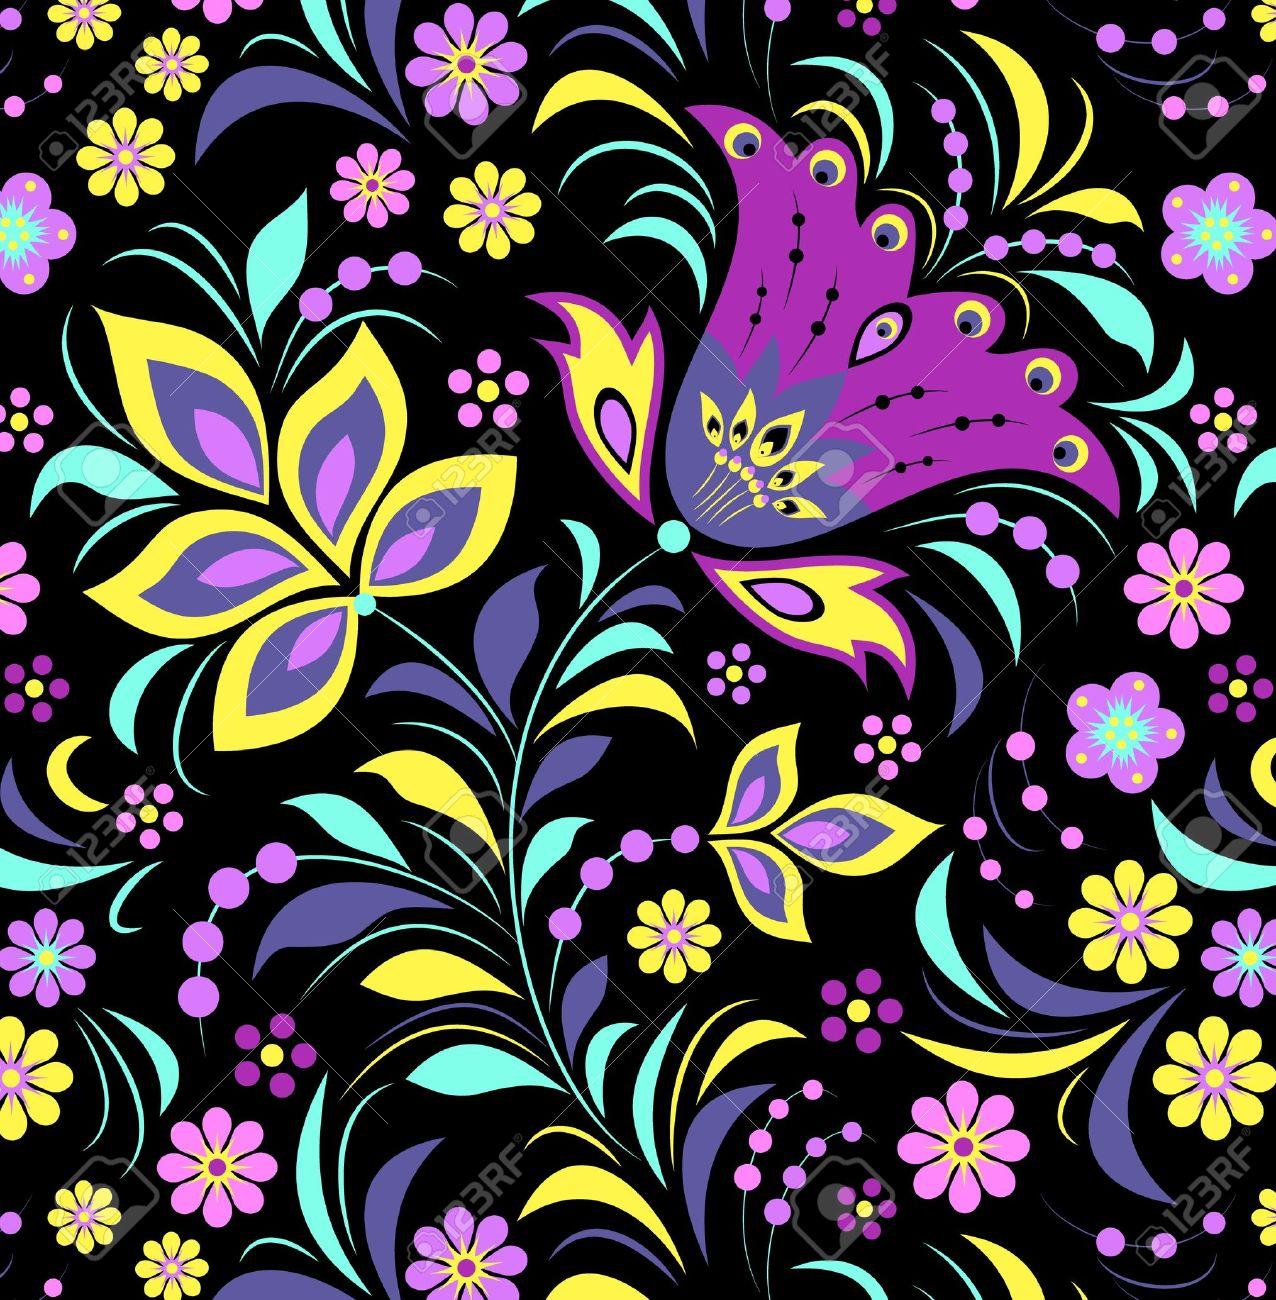 Illustration of  colorful flower on black background. Stock Vector - 12077545